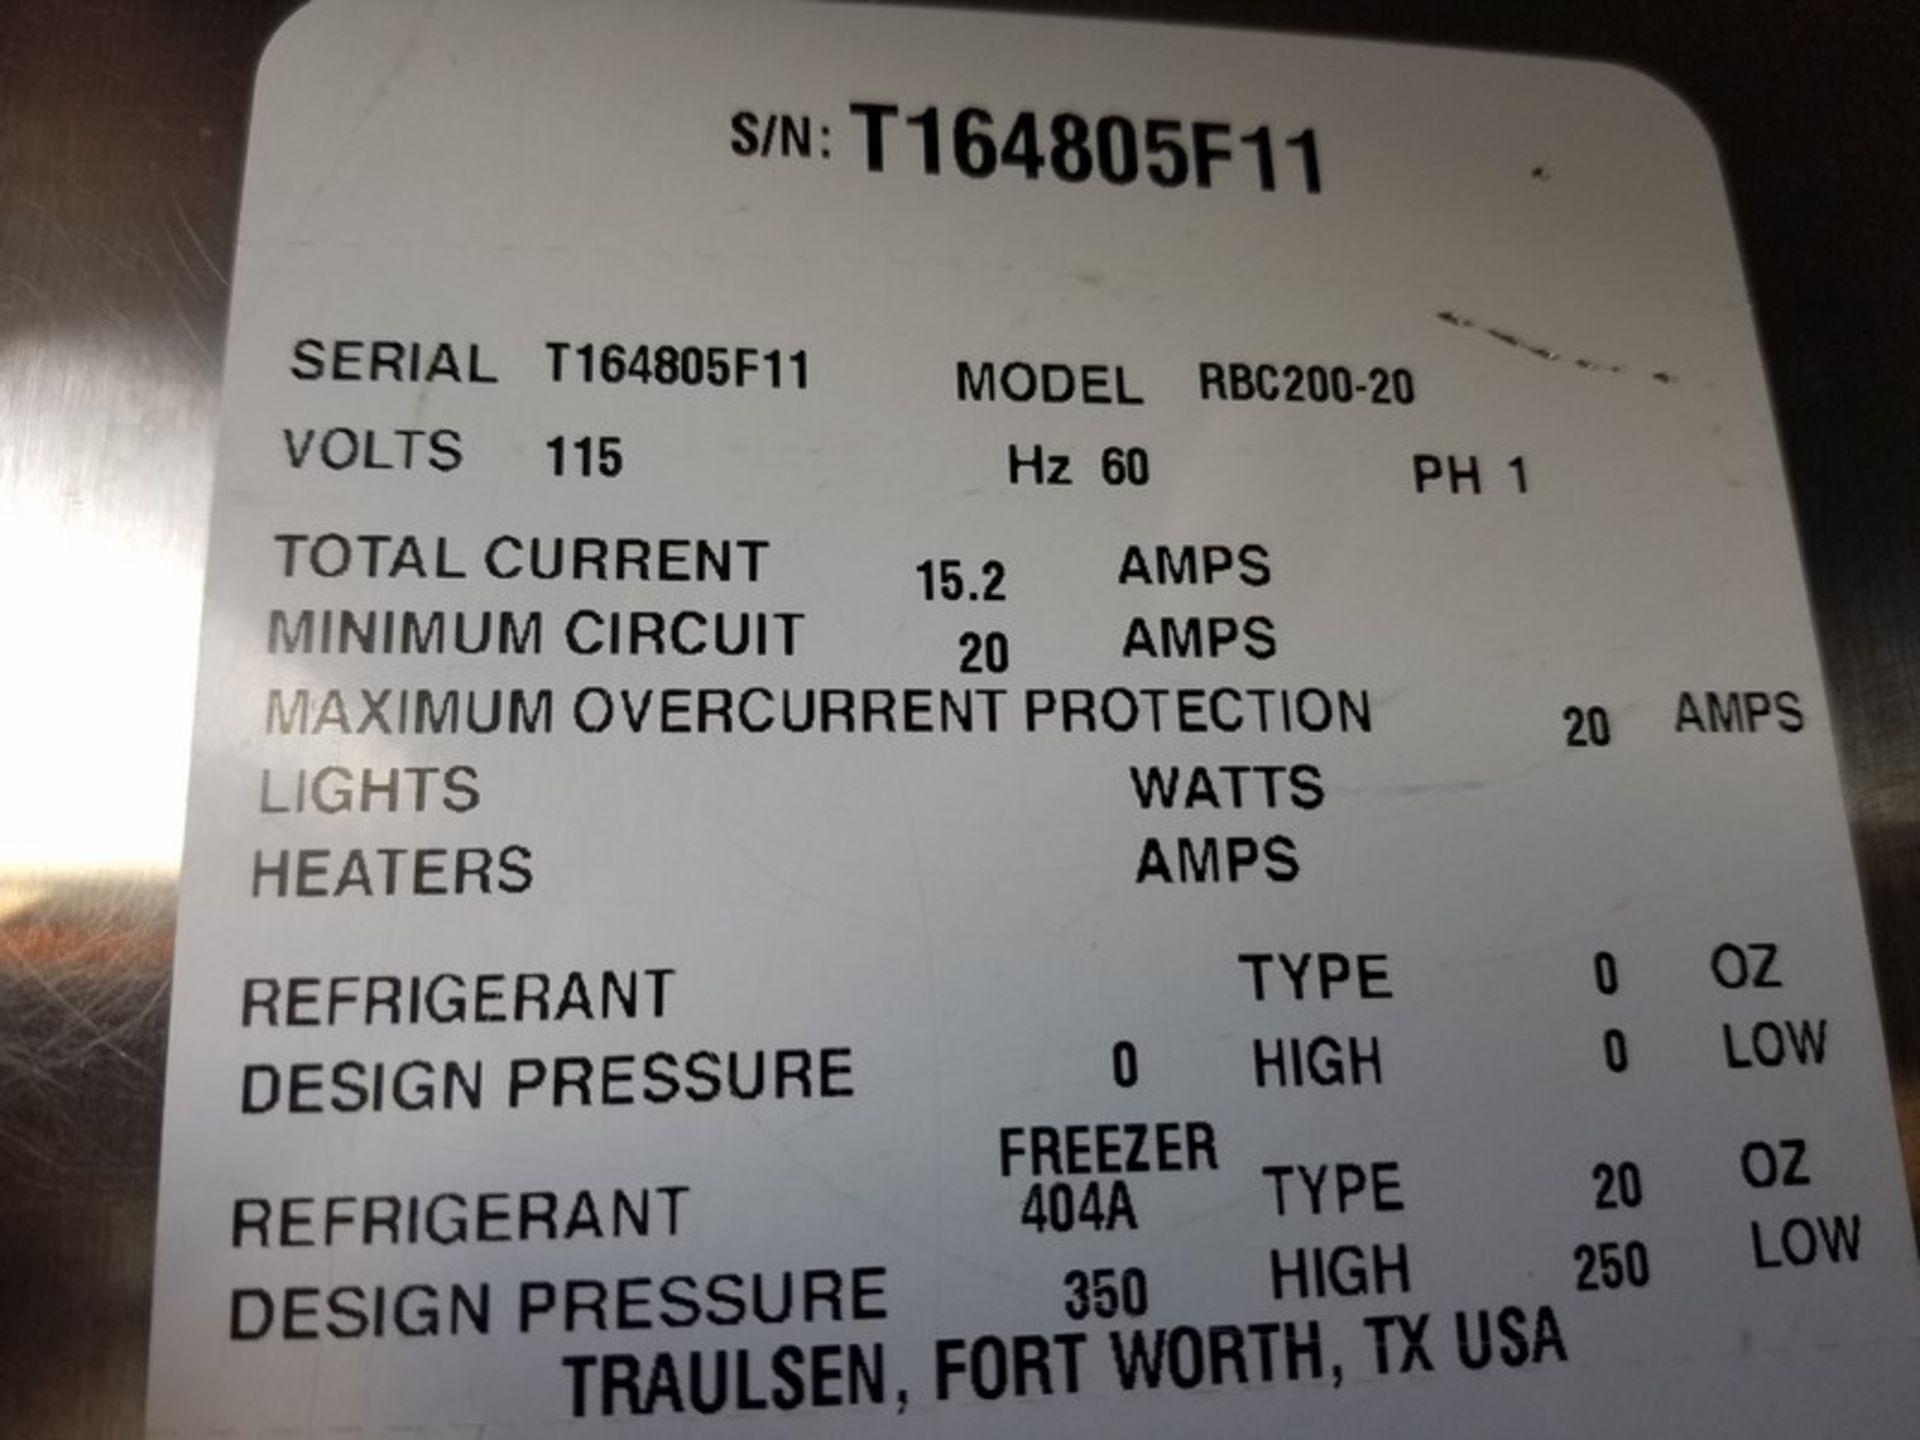 Lot 36 - Traulsen S/S Single Rack Blast Chiller, M/N RBC200-28, S/N T164805F11, Refrigerant 404A, Design